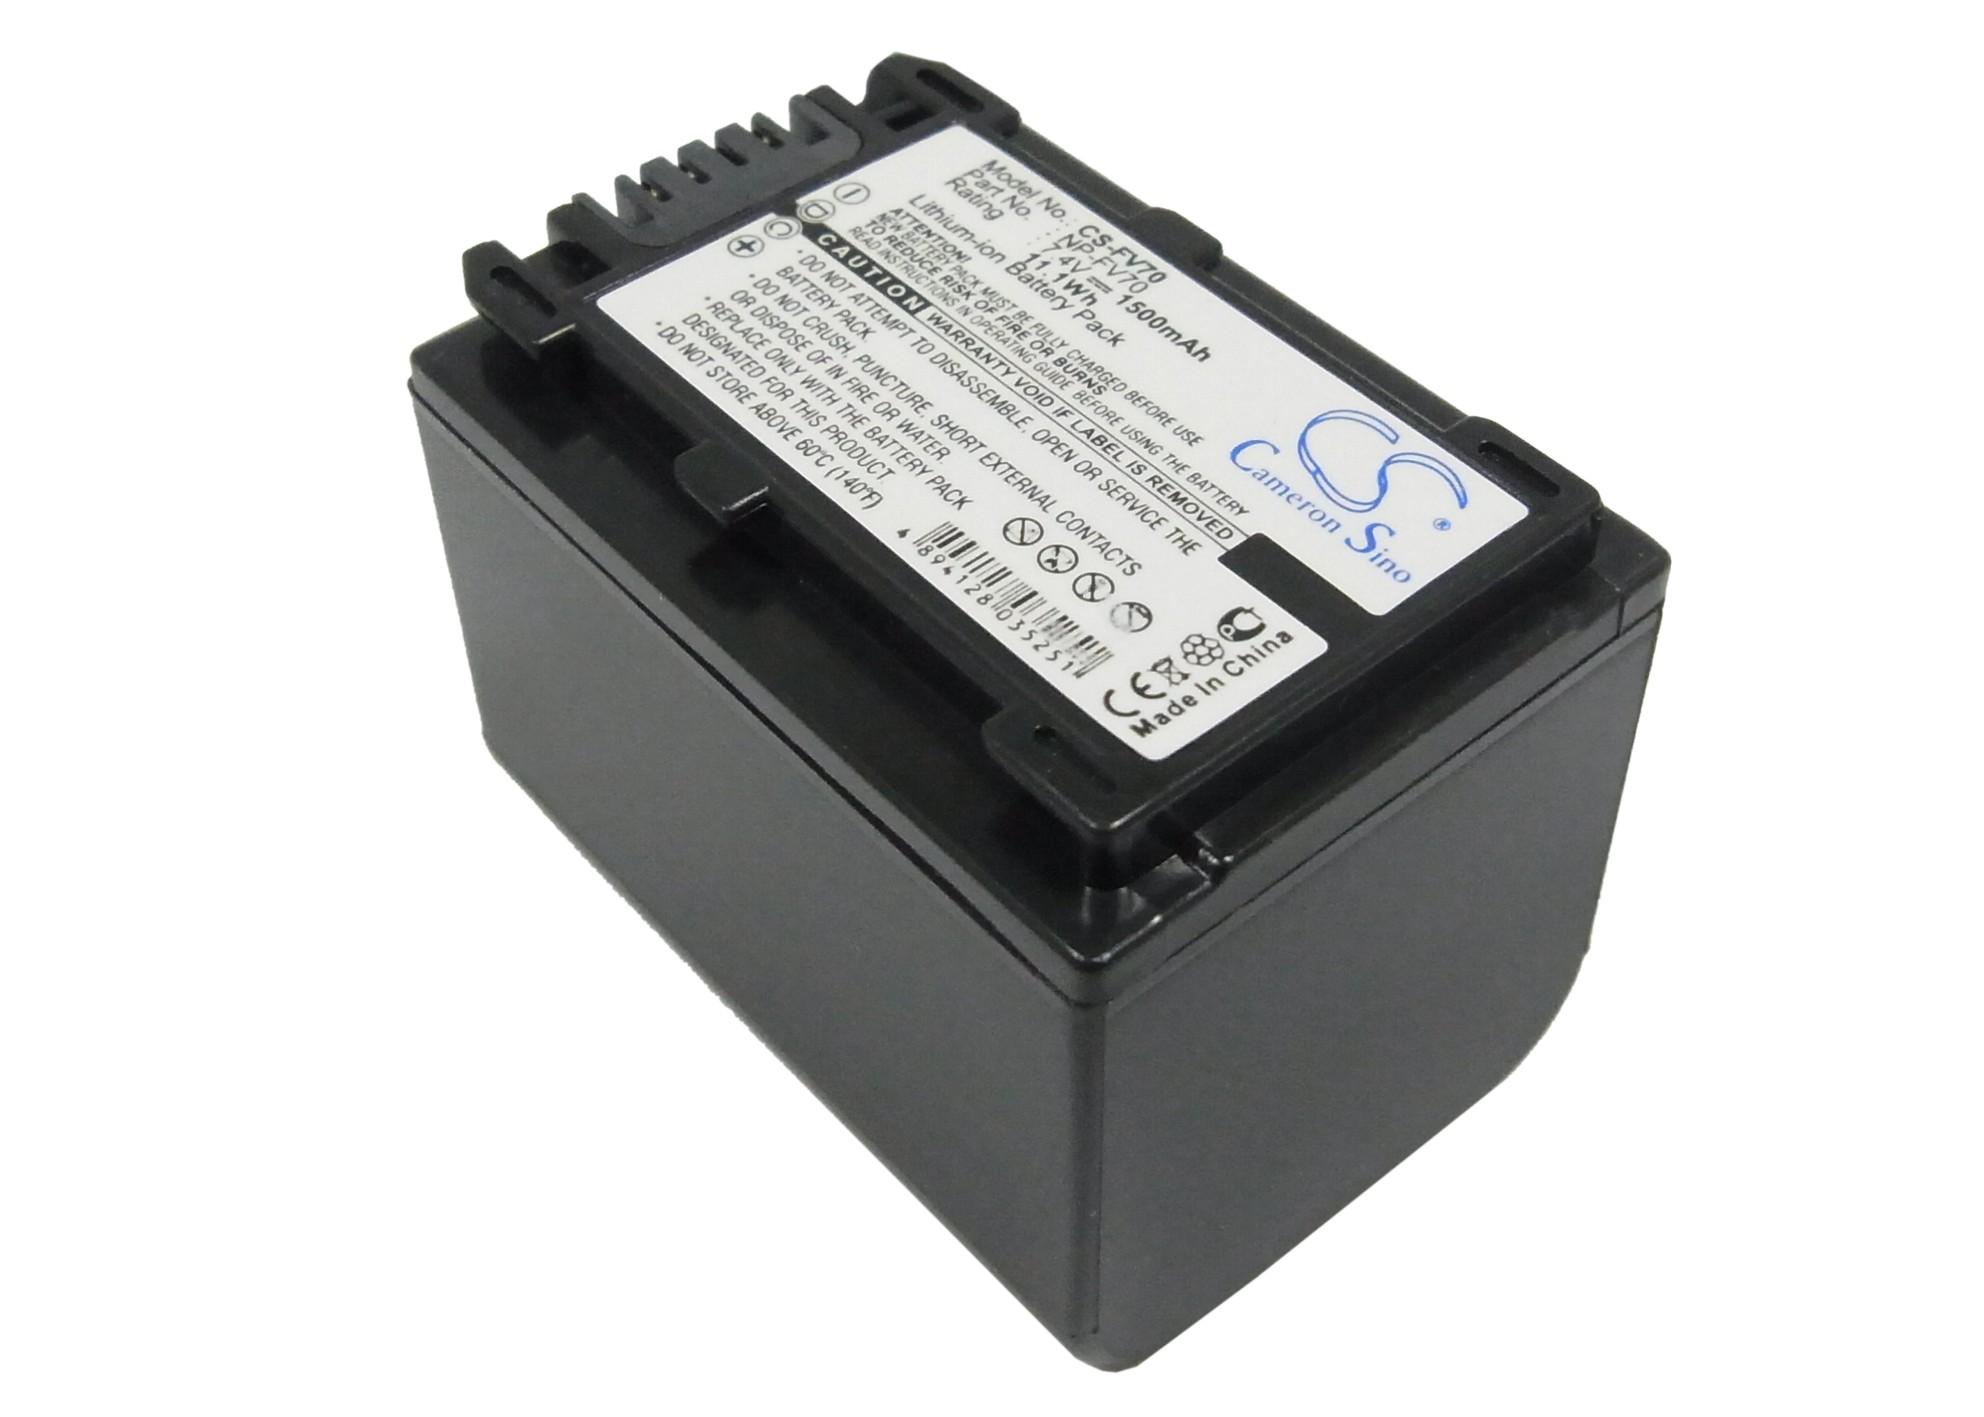 Cameron Sino baterie do kamer a fotoaparátů pro SONY DCR-SR68R 7.4V Li-ion 1500mAh černá - neoriginální